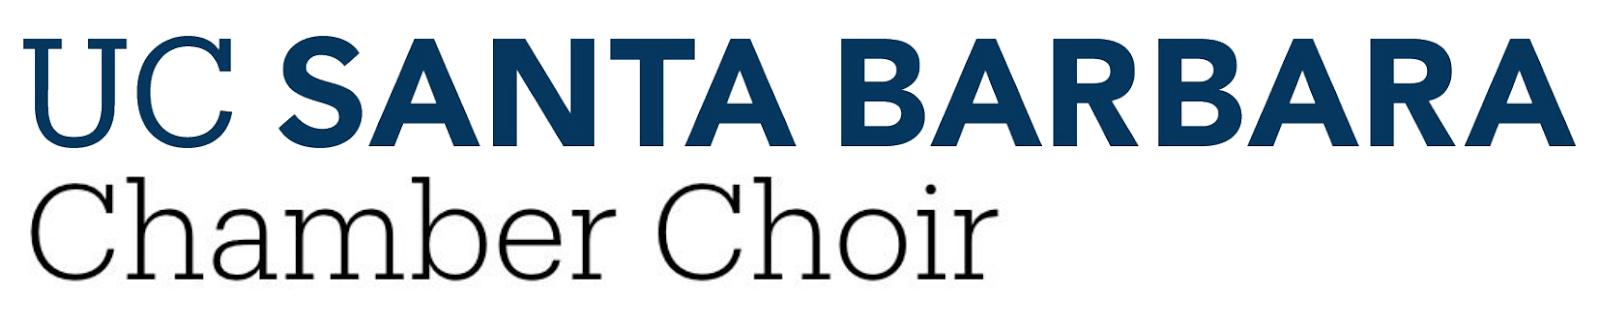 UC Santa Barbara Chamber Choir logo